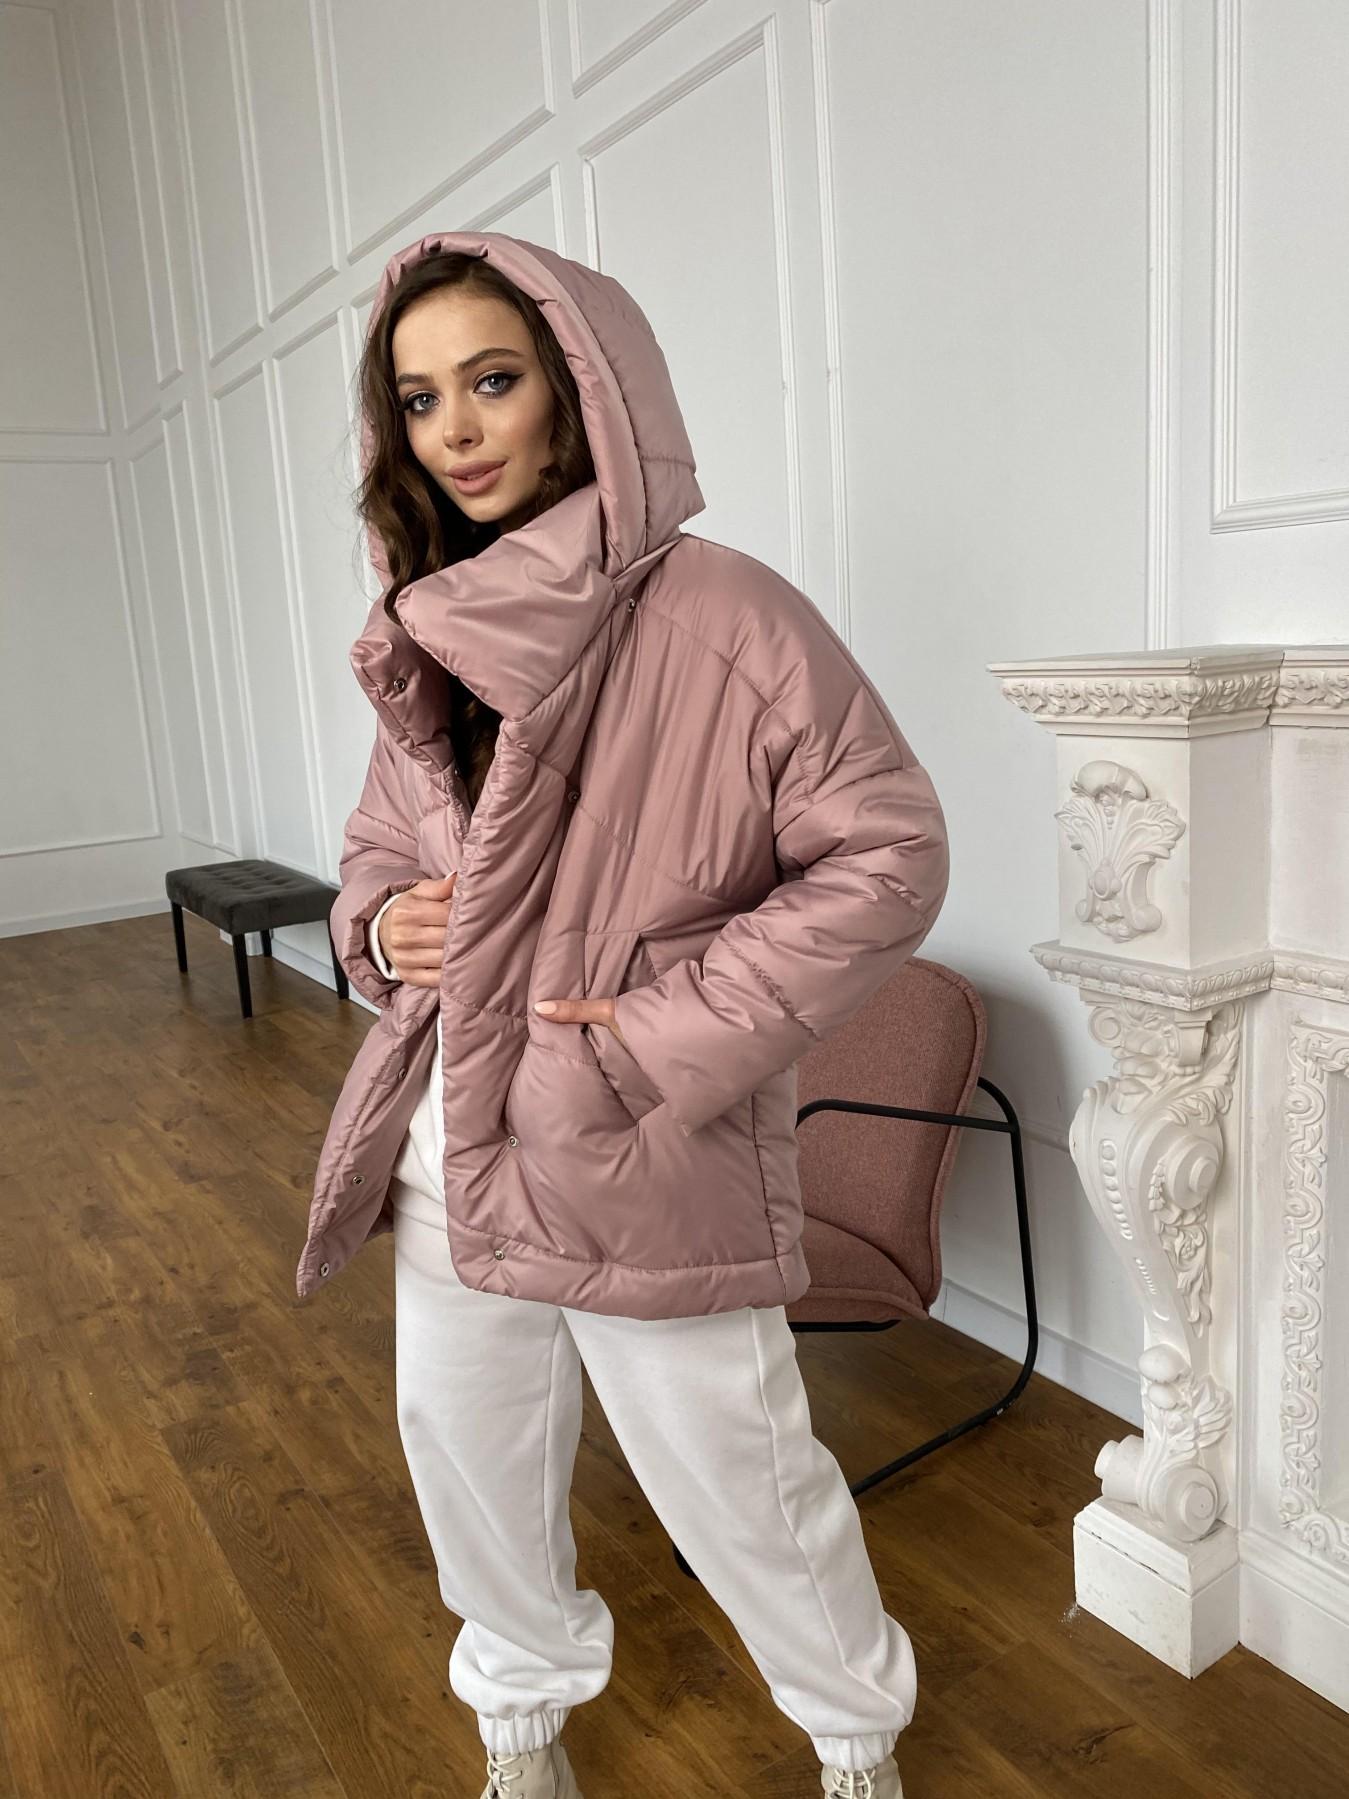 Уно куртка плащевка Ammy 10671 АРТ. 47409 Цвет: Пудра - фото 4, интернет магазин tm-modus.ru